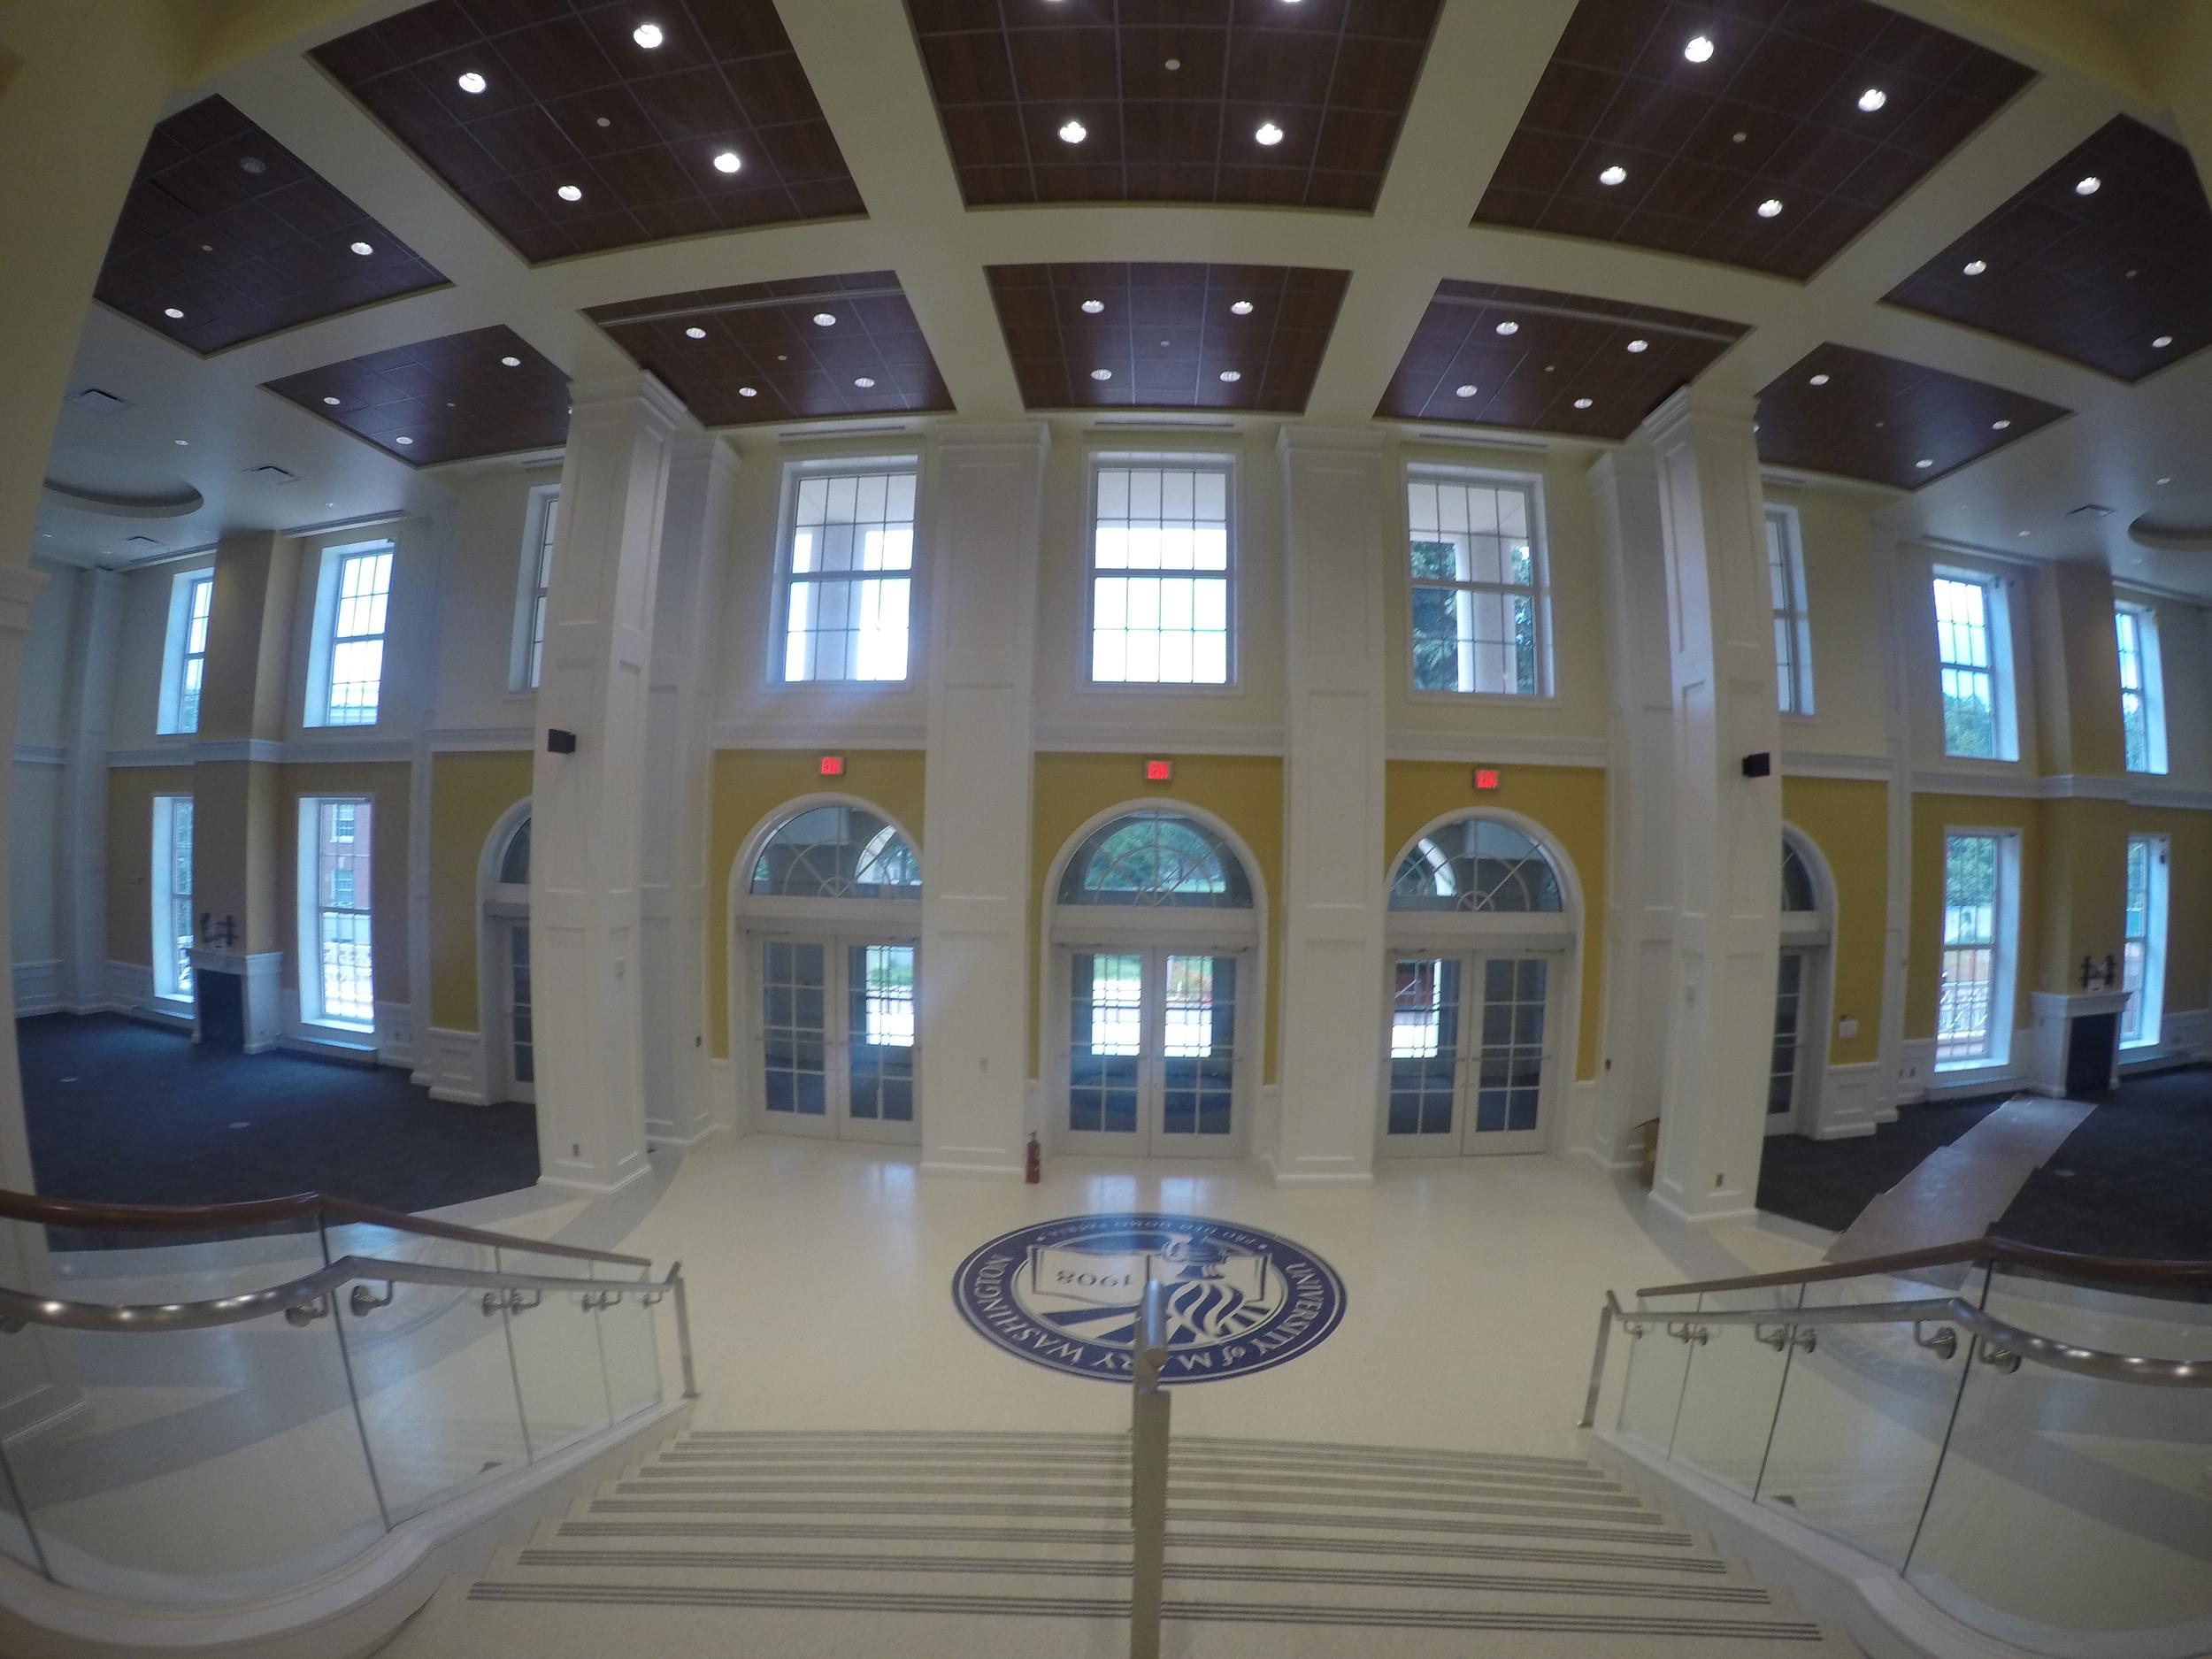 University Of Mary Washington Campus Center- Fredericksburg, VA